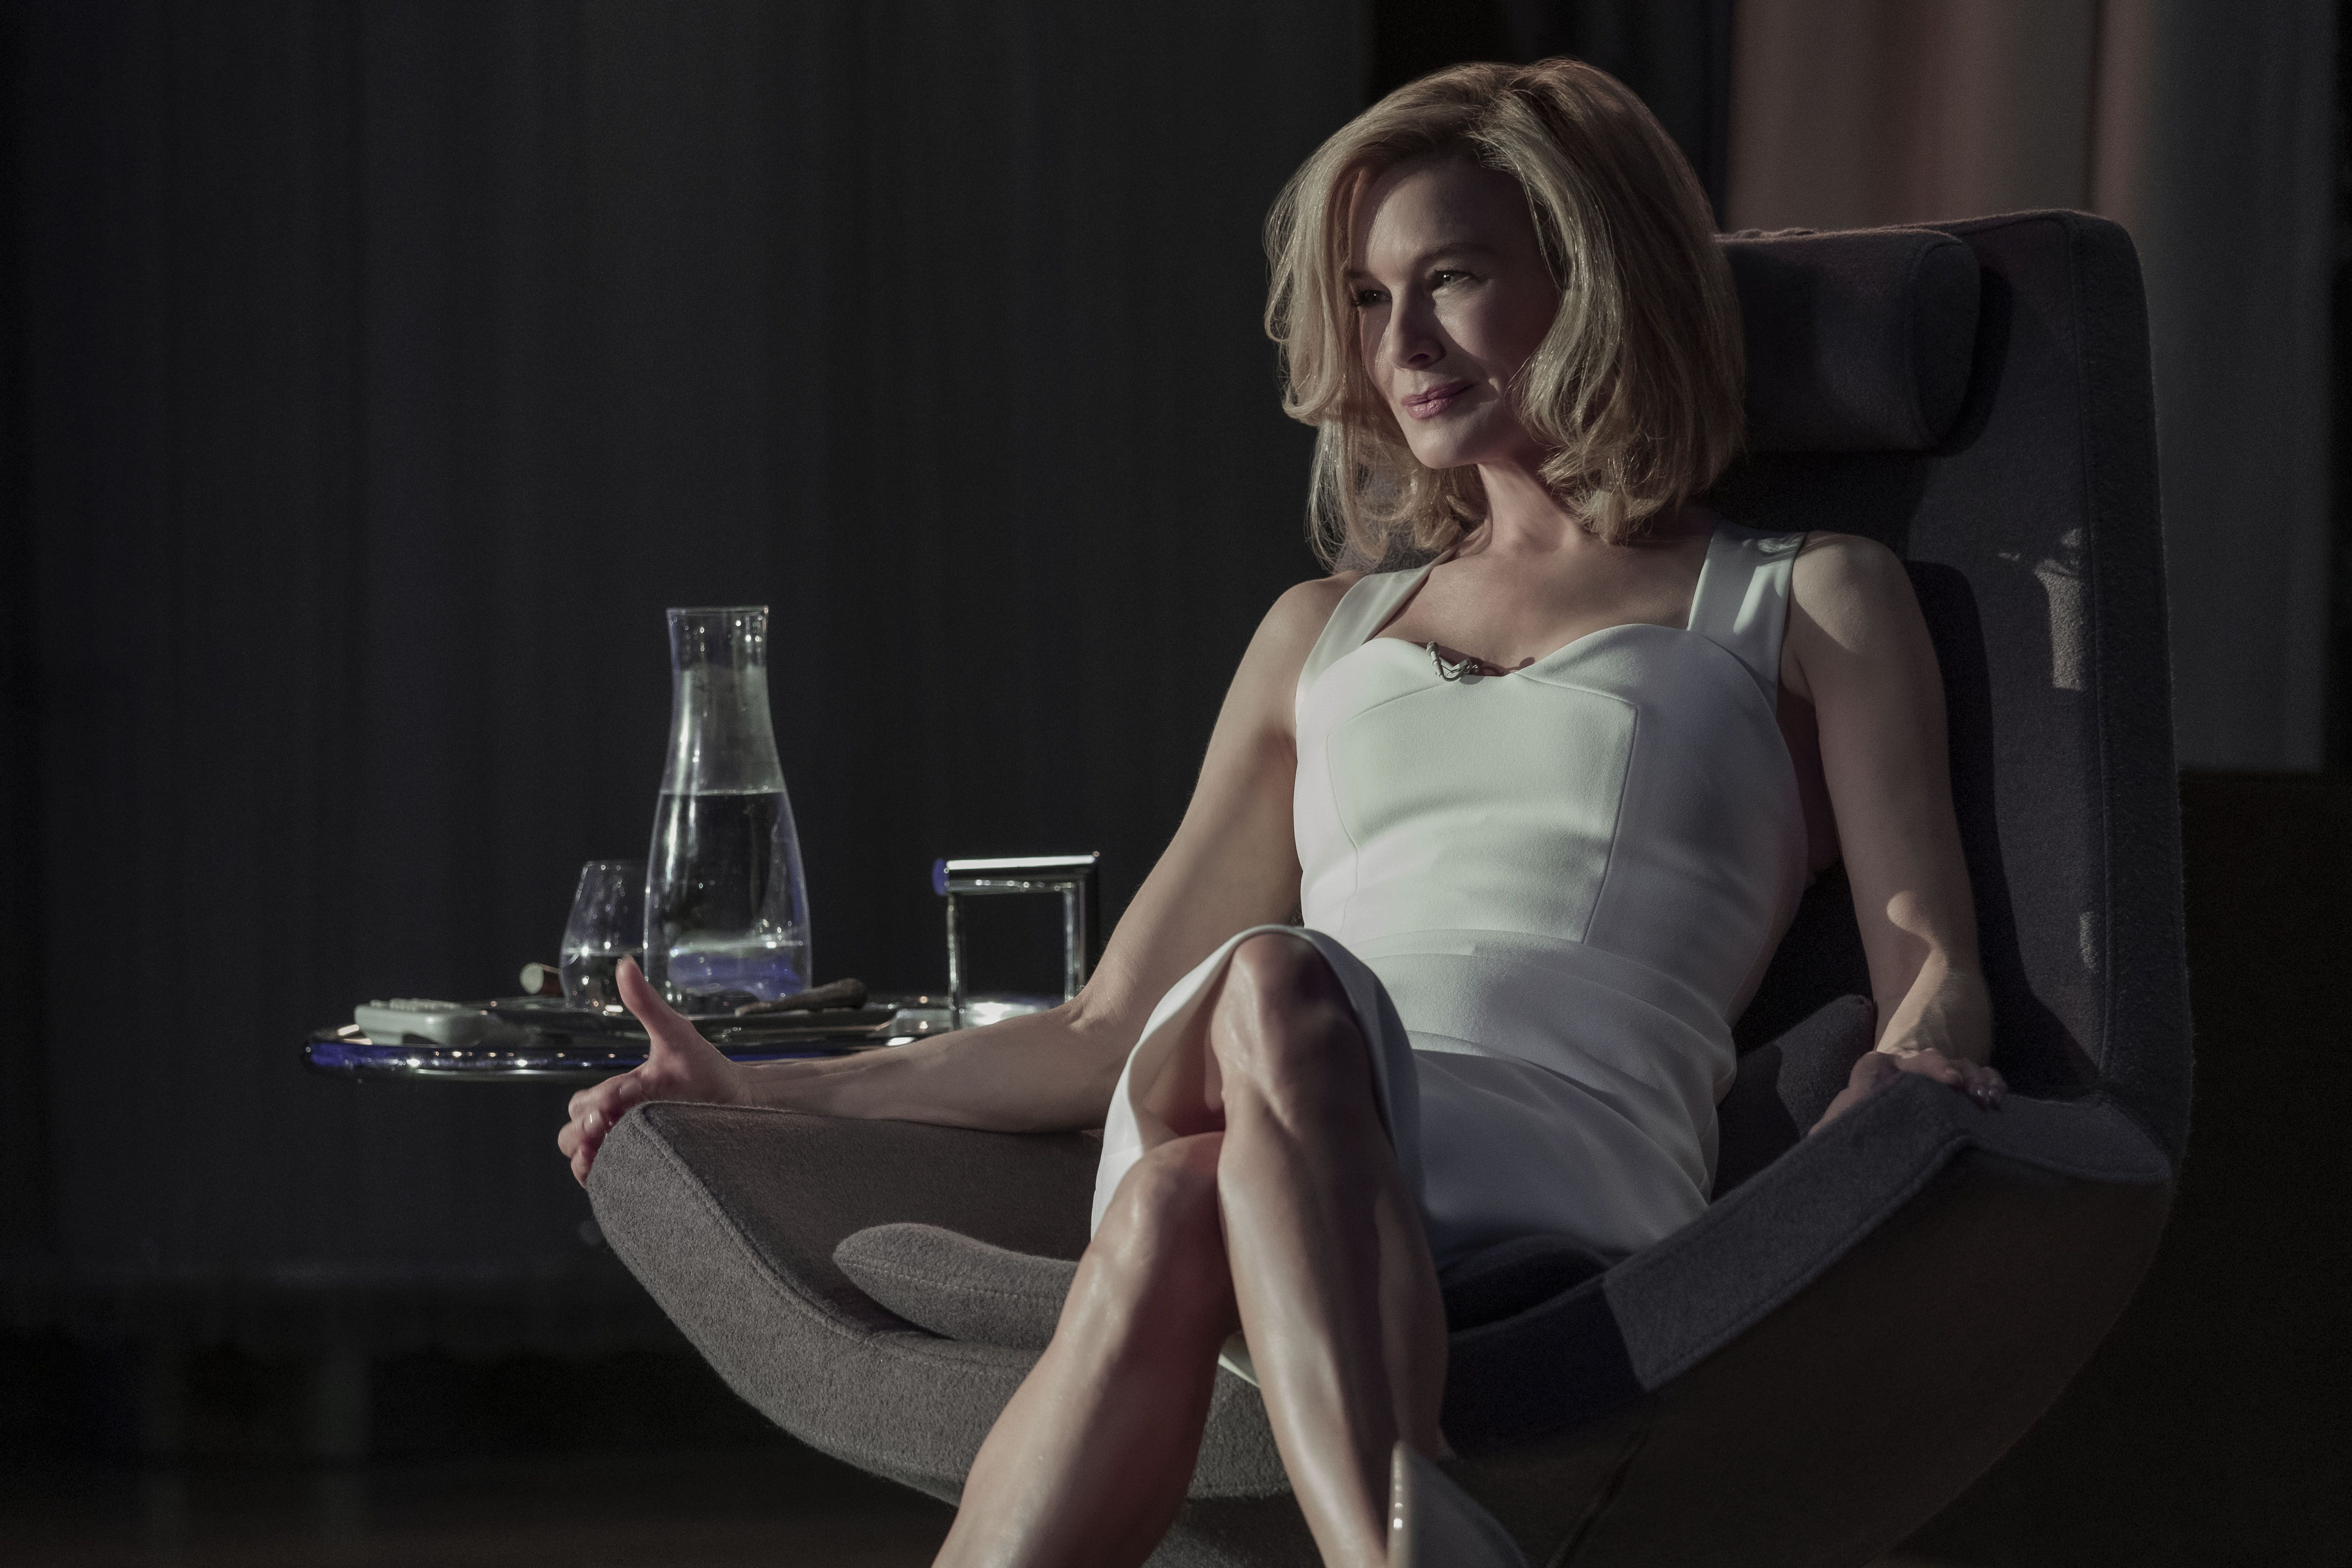 Netflix Thriller What/If, Starring Renee Zellweger, Looks Amazing